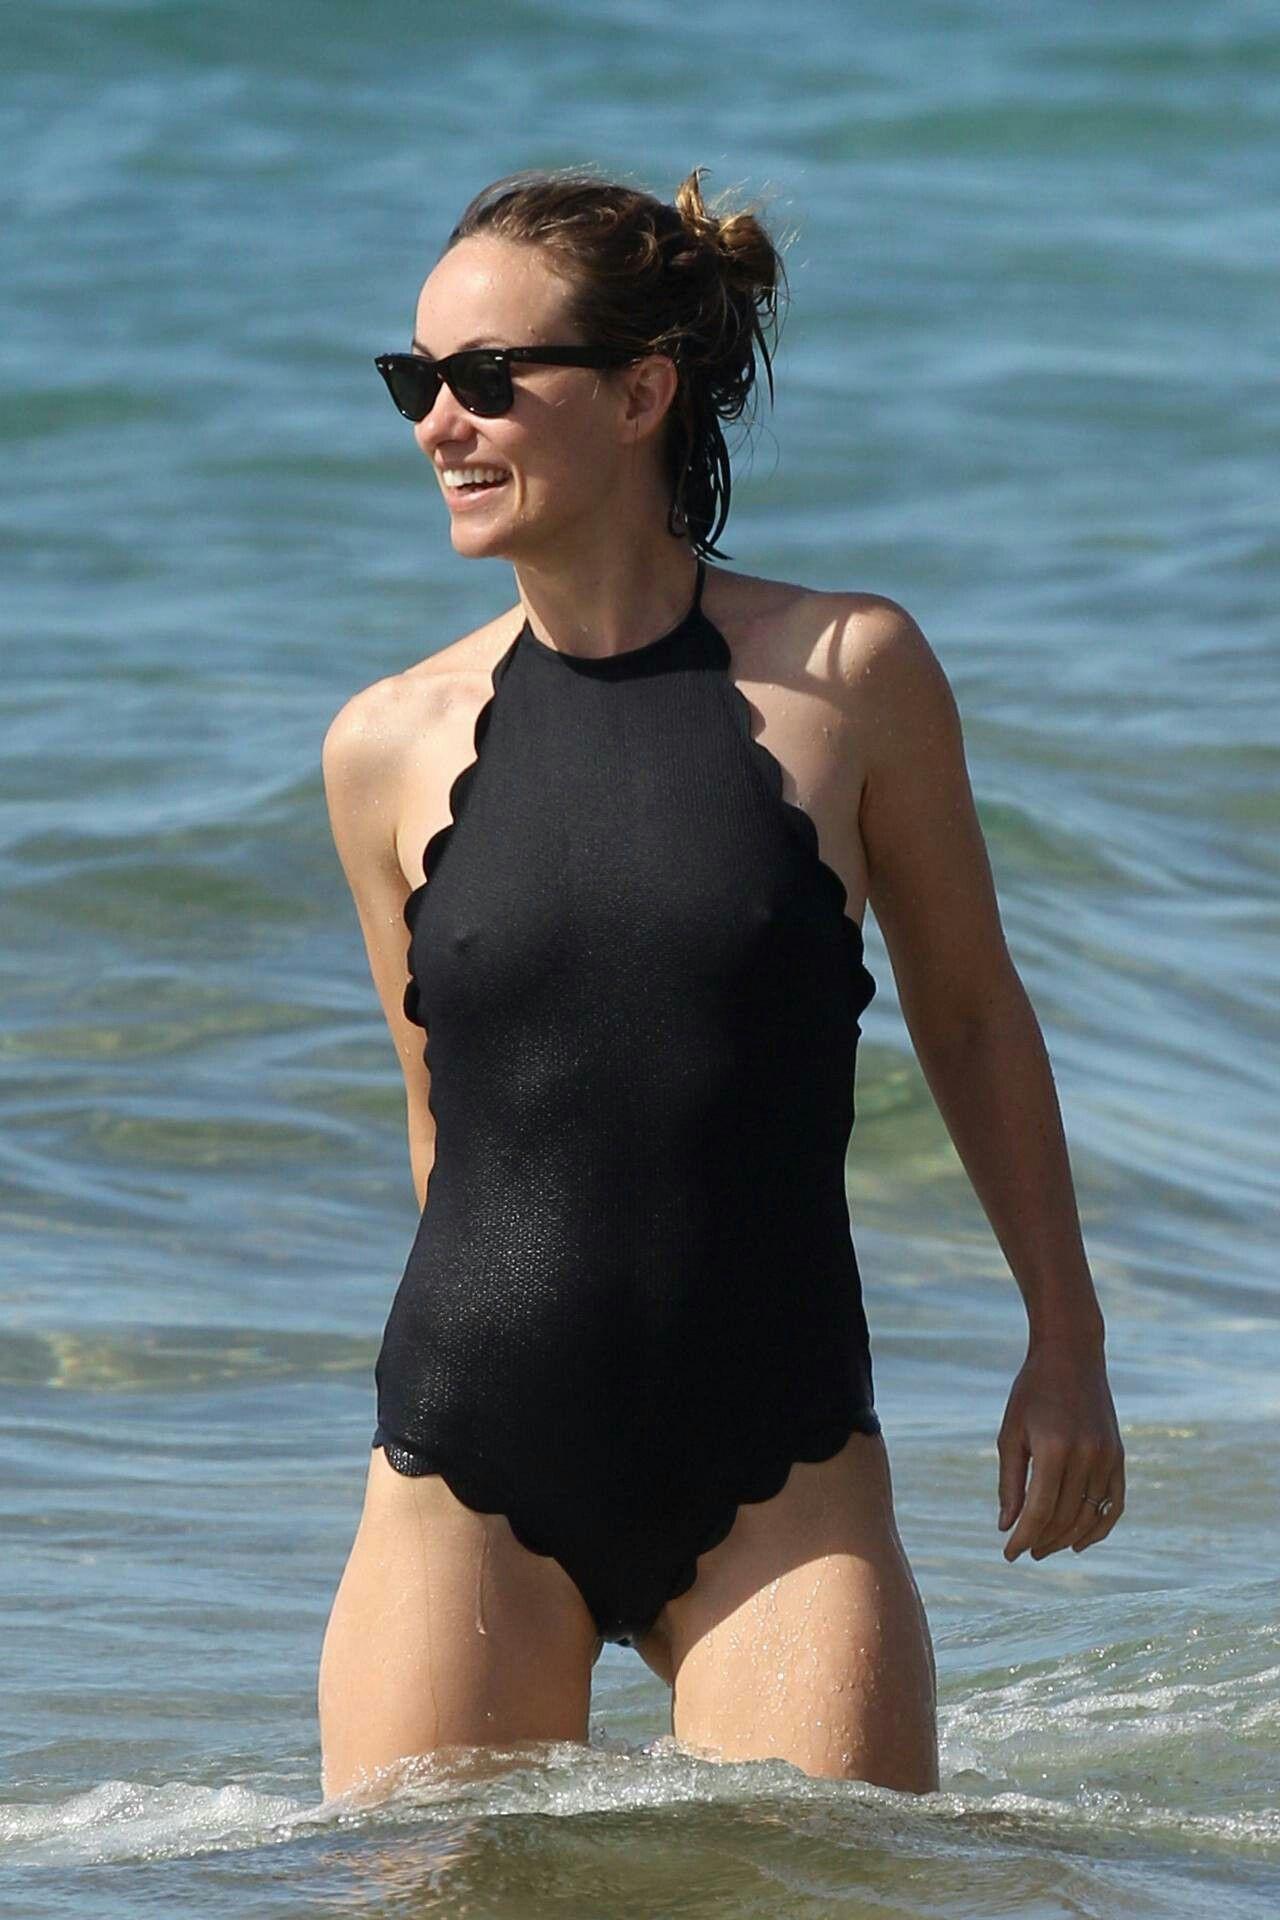 Alison Sweeney Oops olivia wilde poker | olivia wilde bikini, olivia wilde, celebs